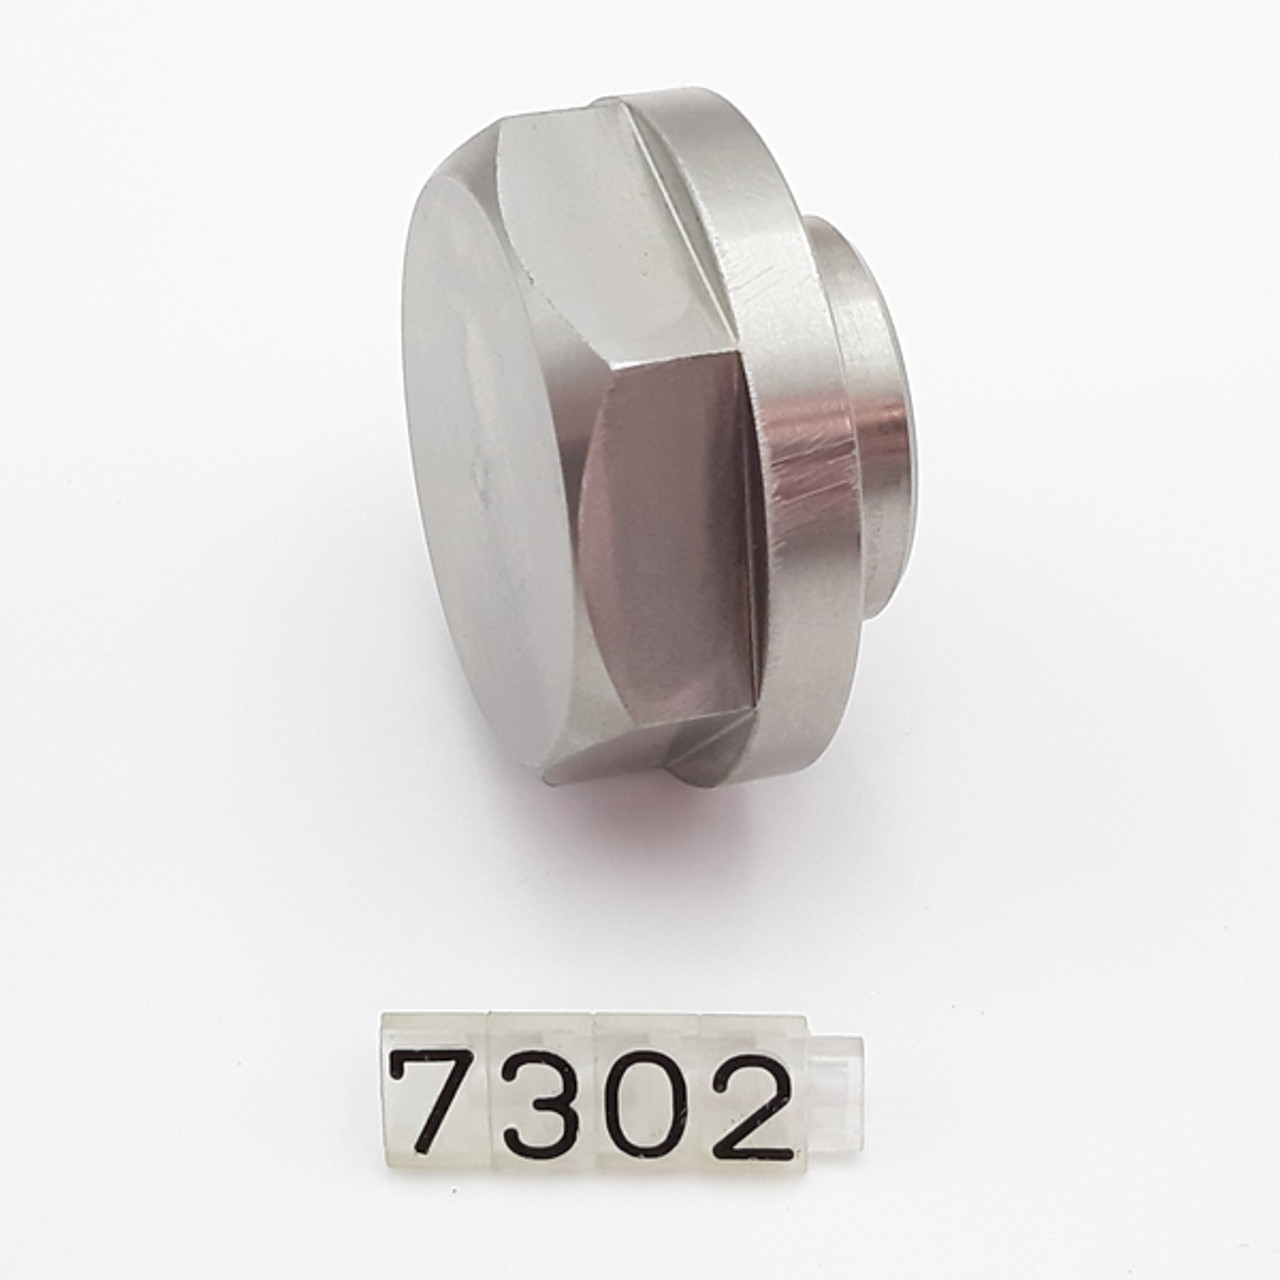 Talsa K-649 - K15e & K15v - Blocked Nut - End of Knife Shaft - 7302